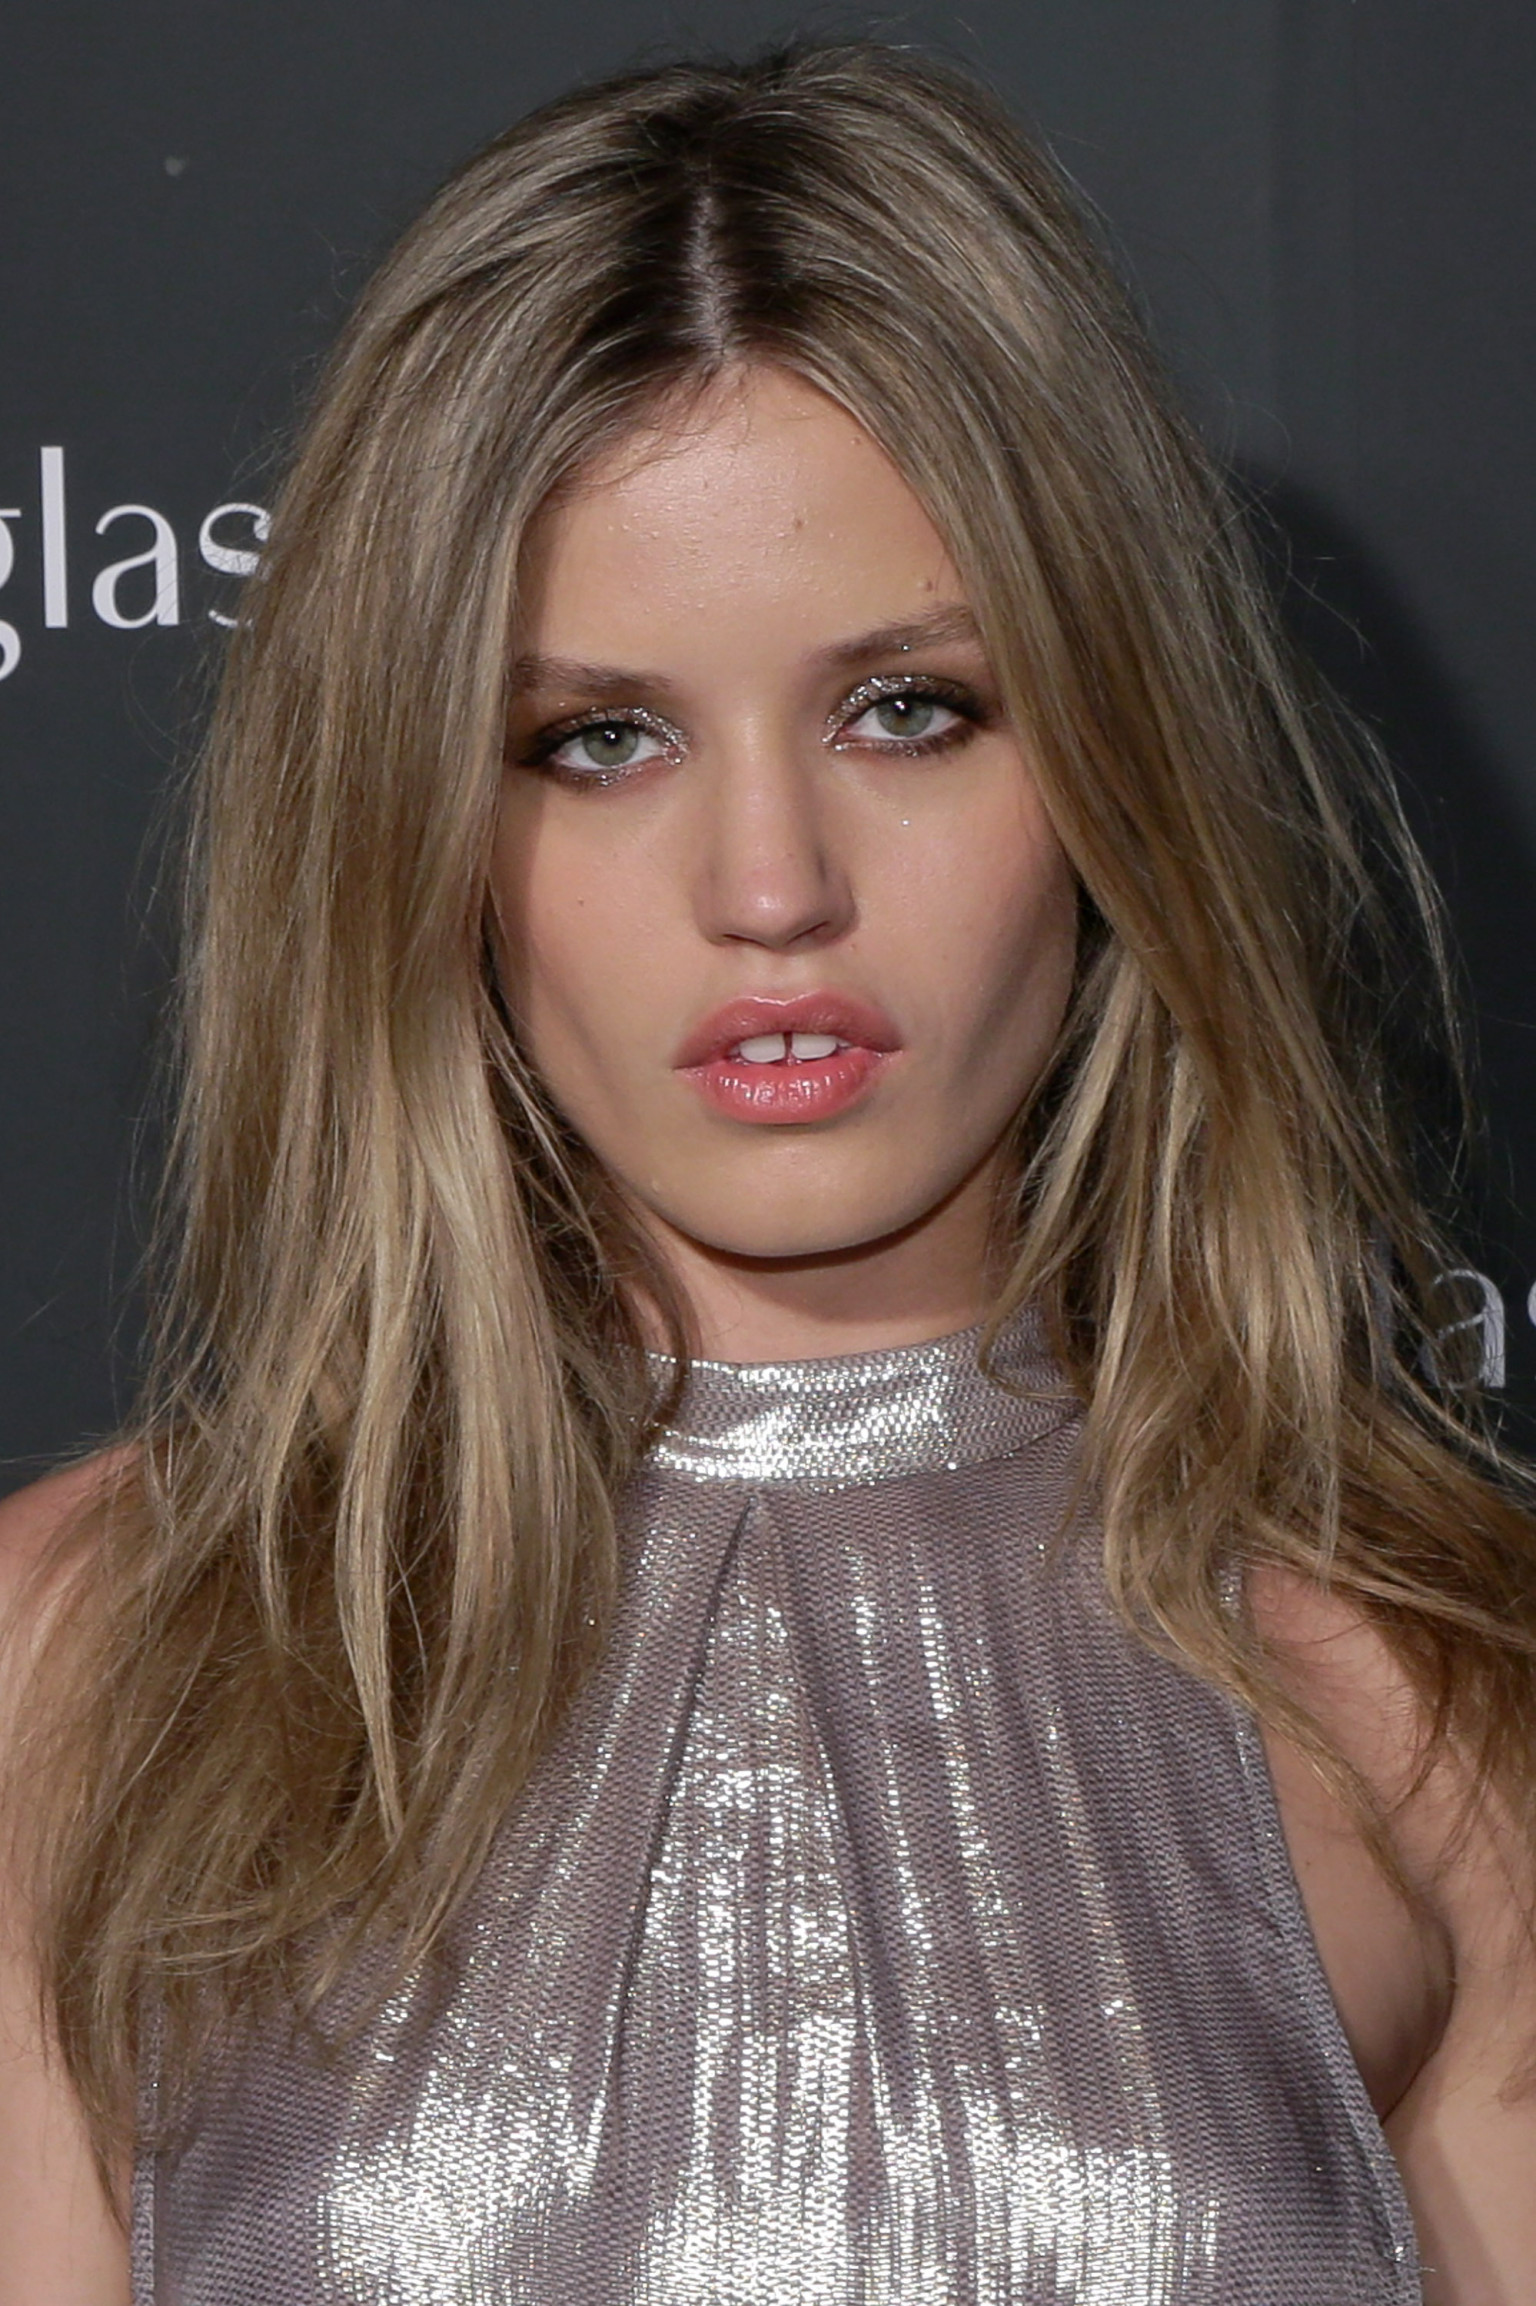 Georgia May Jagger Suffers A Nip Slip At New York Fashion